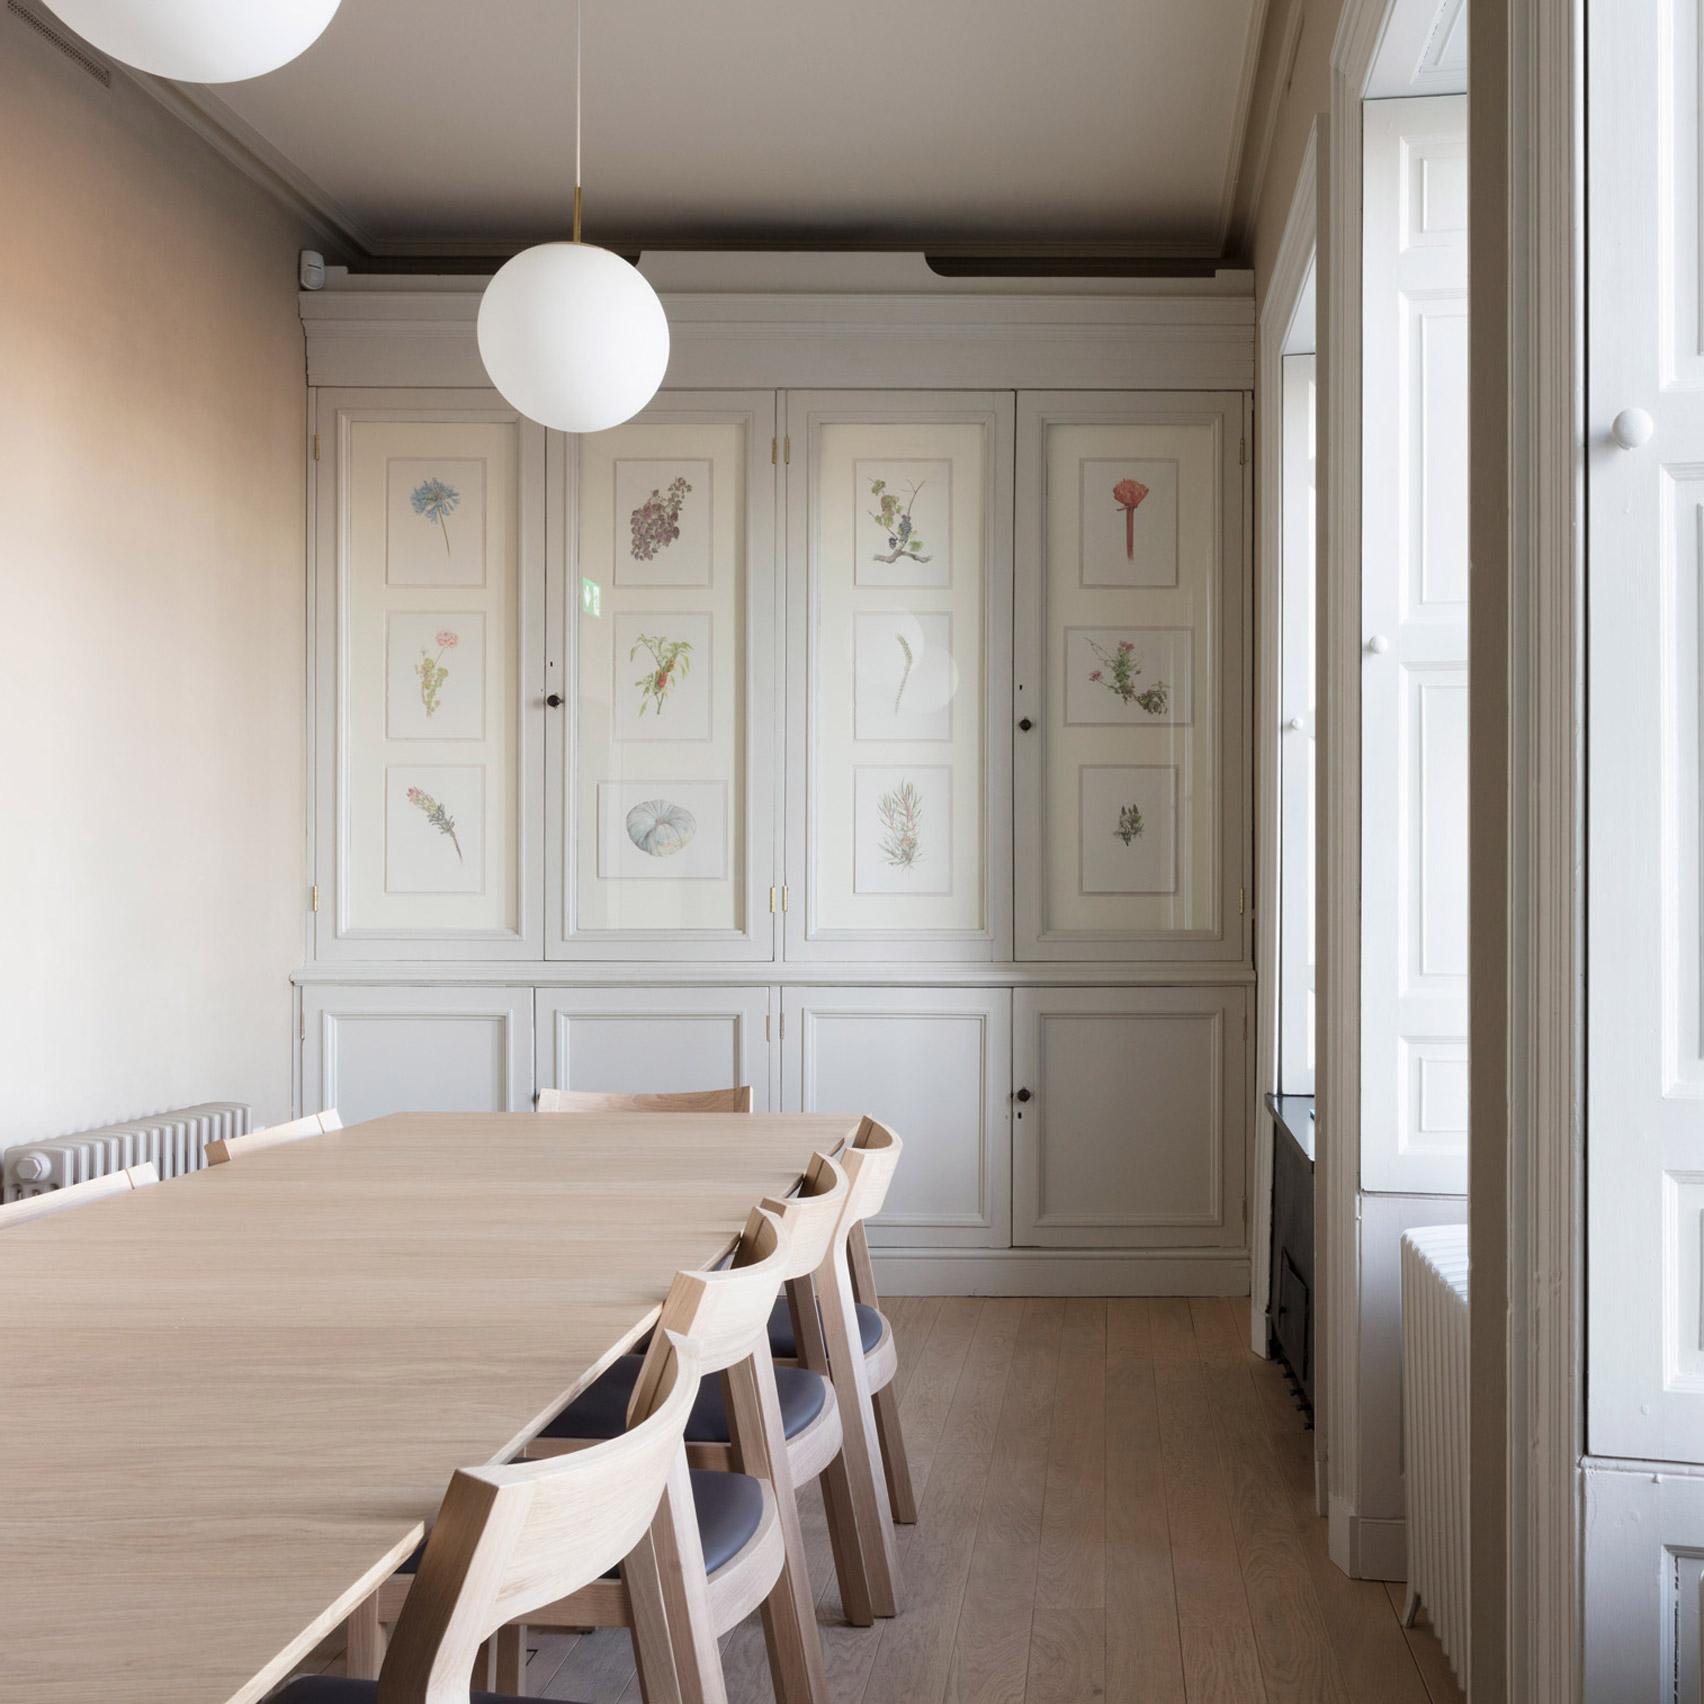 Collective by Collective Architecture in Edinburgh, Scotland